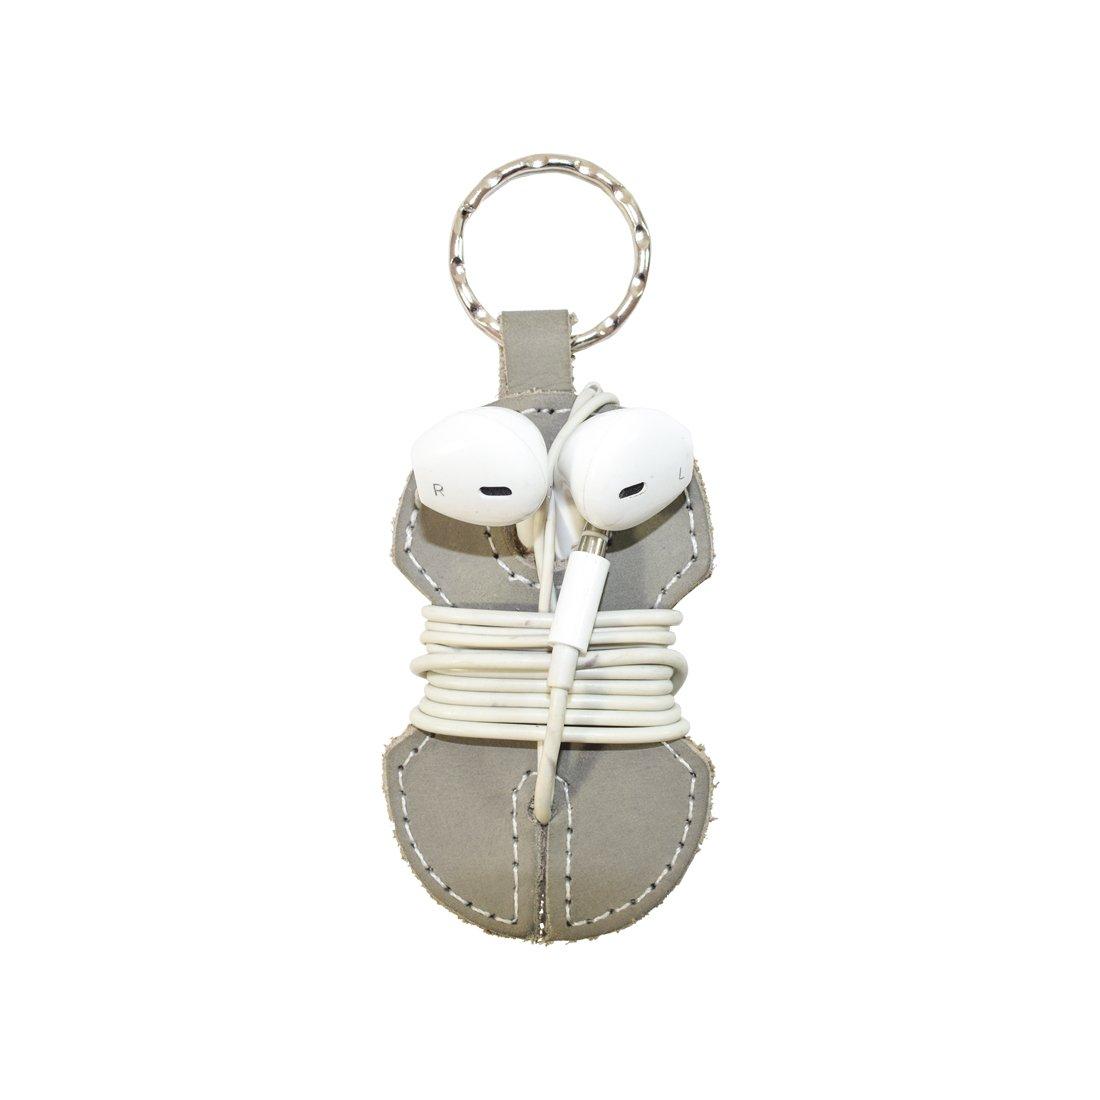 Leather Key Chain & Headphone Wrap Handmade by Hide & Drink :: Stone Gray